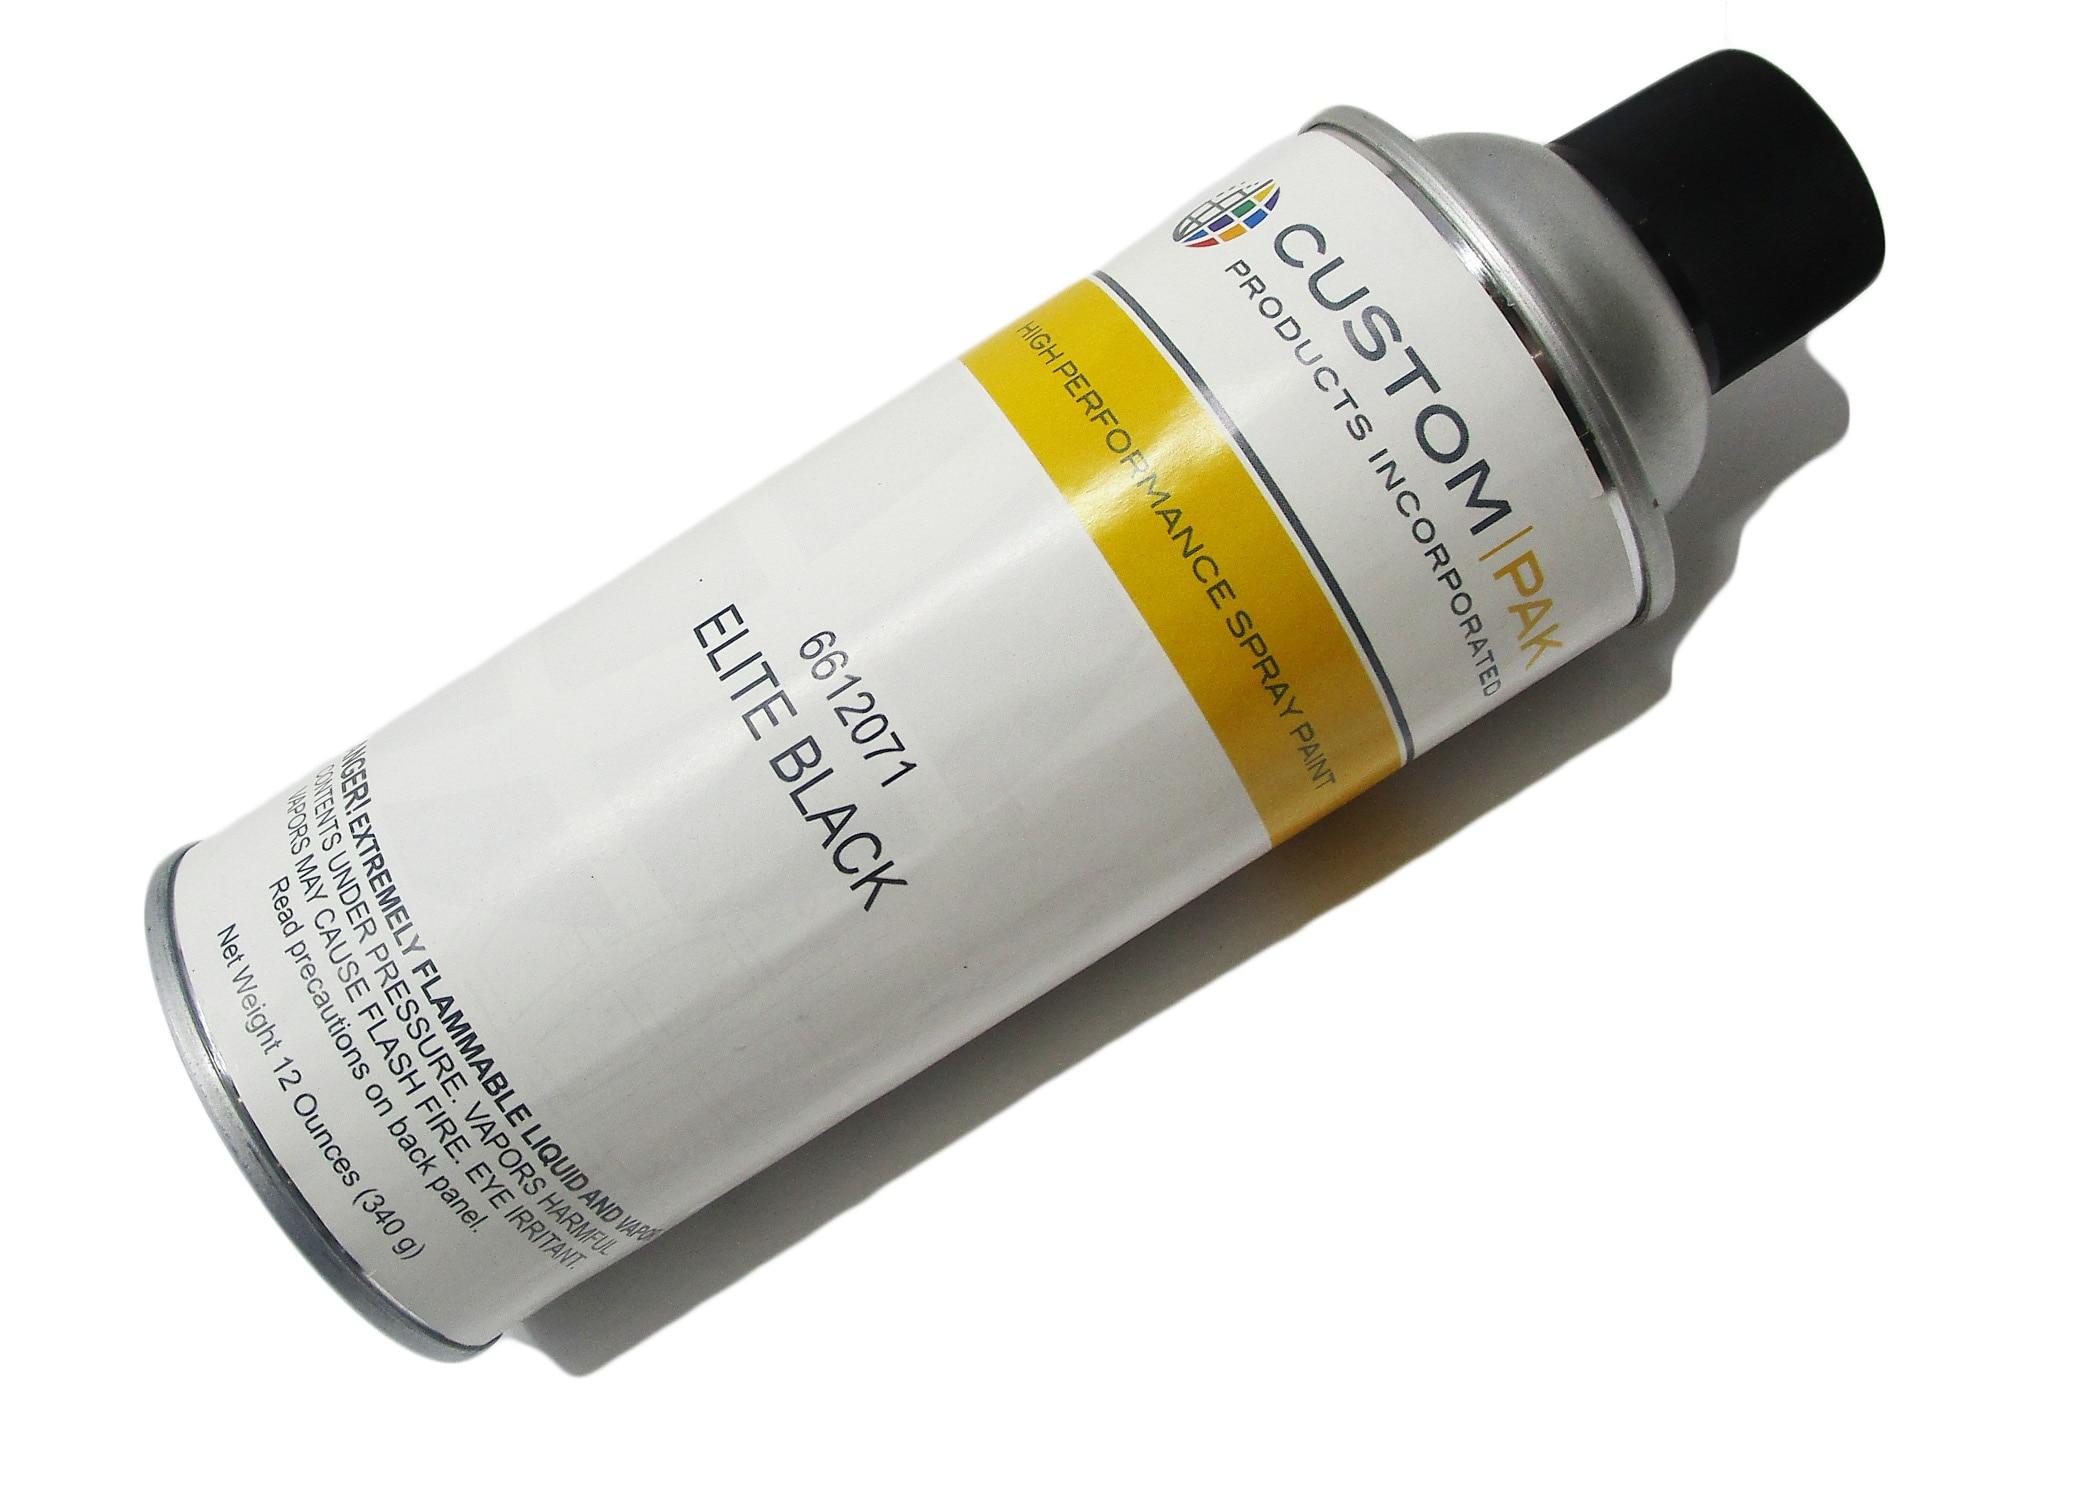 JET — Touch-up Spray Paint, Elite Black, 12 oz